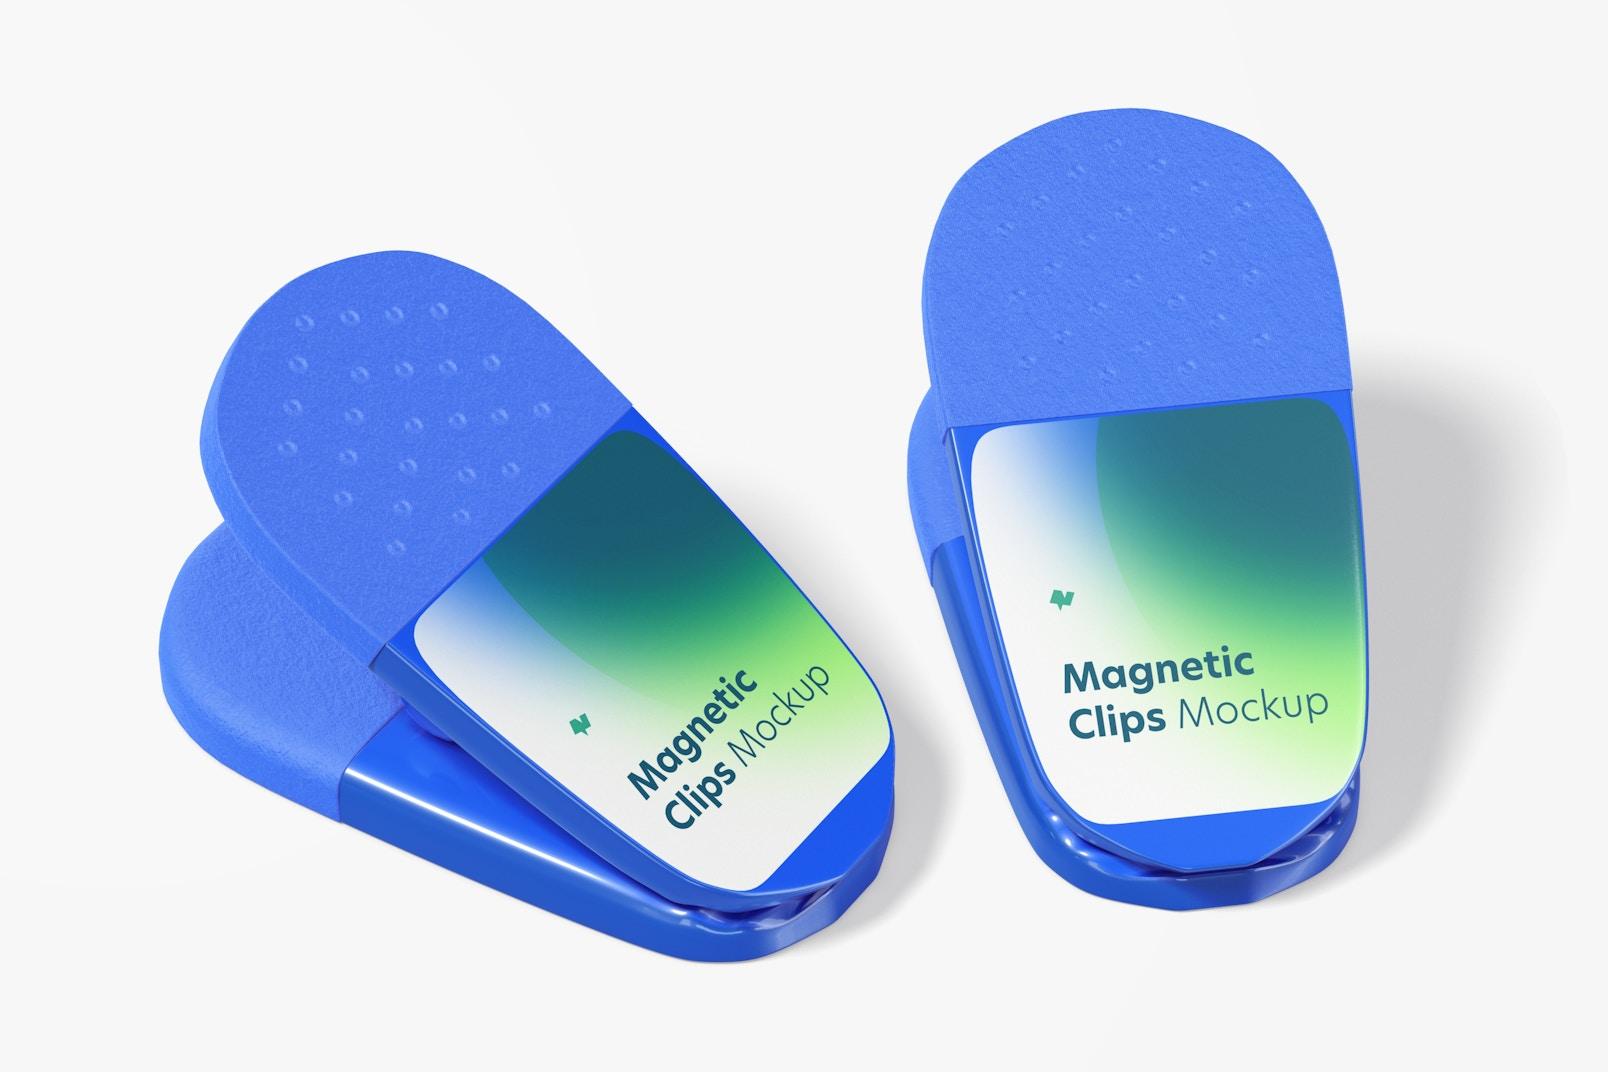 Promotional Magnetic Clips Mockup